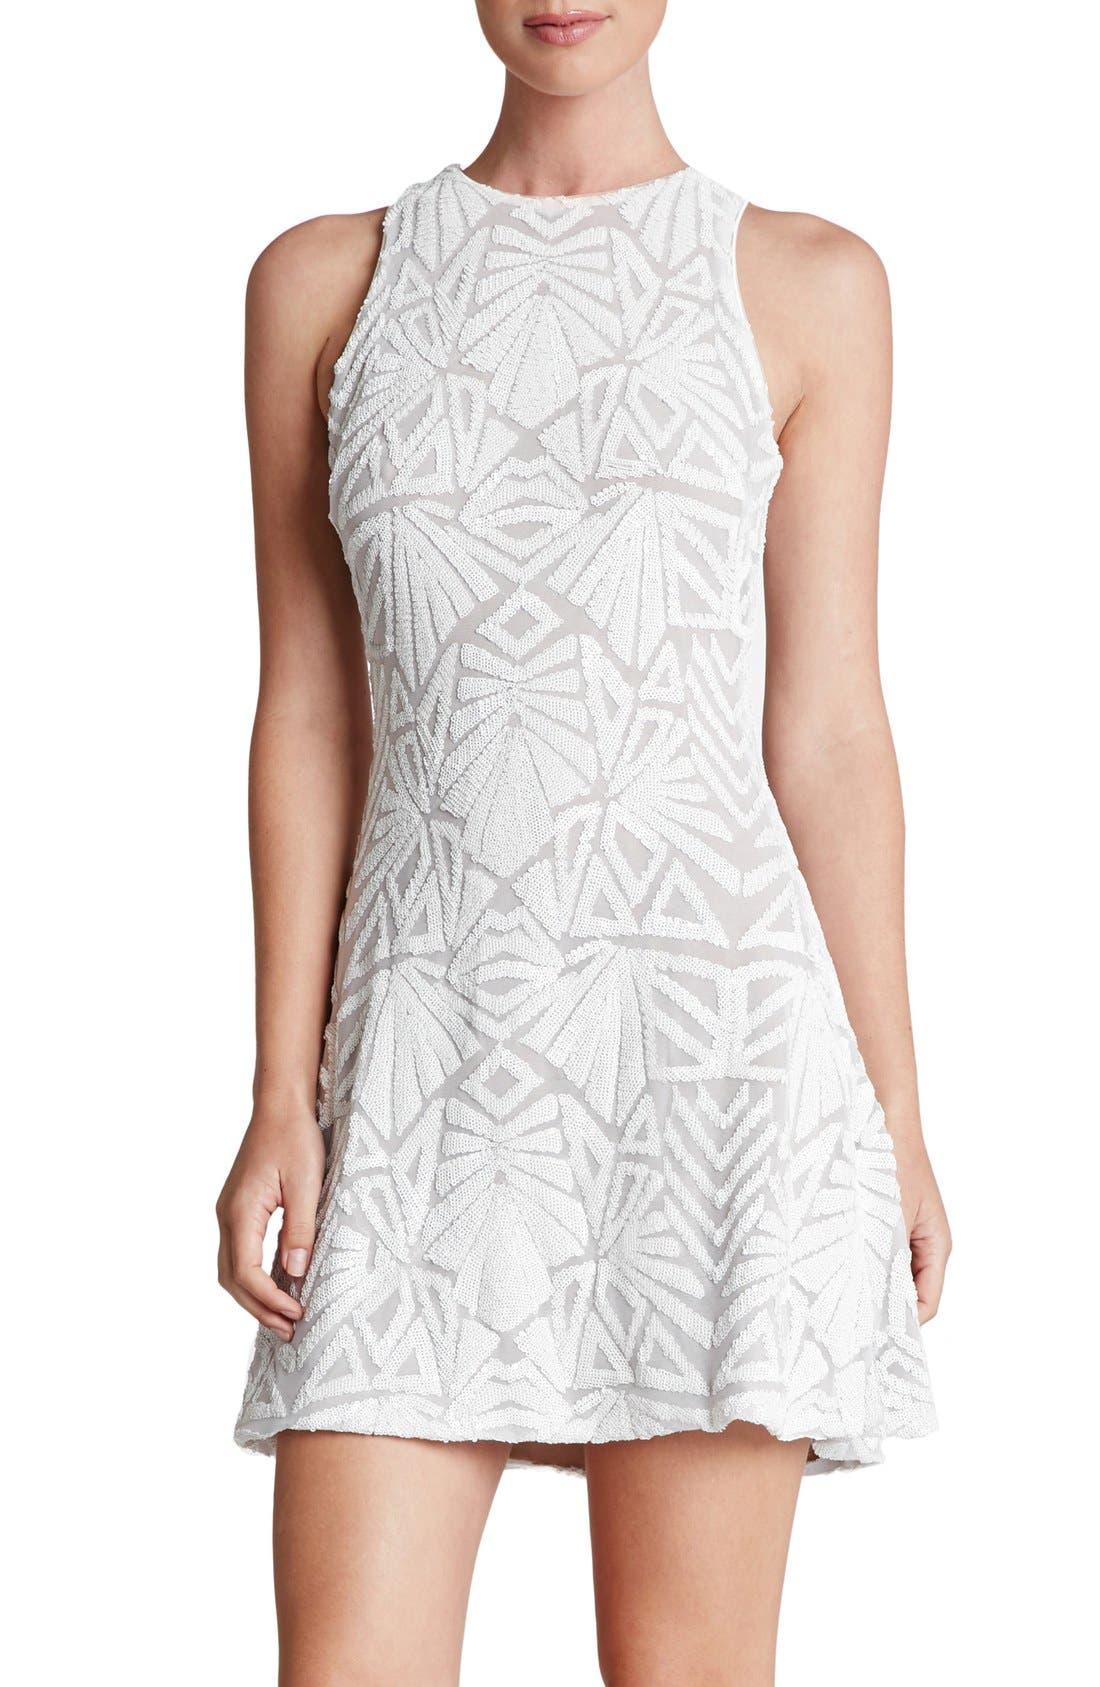 Alternate Image 1 Selected - Dress the Population 'Mia' Sequin Sleeveless Skater Dress